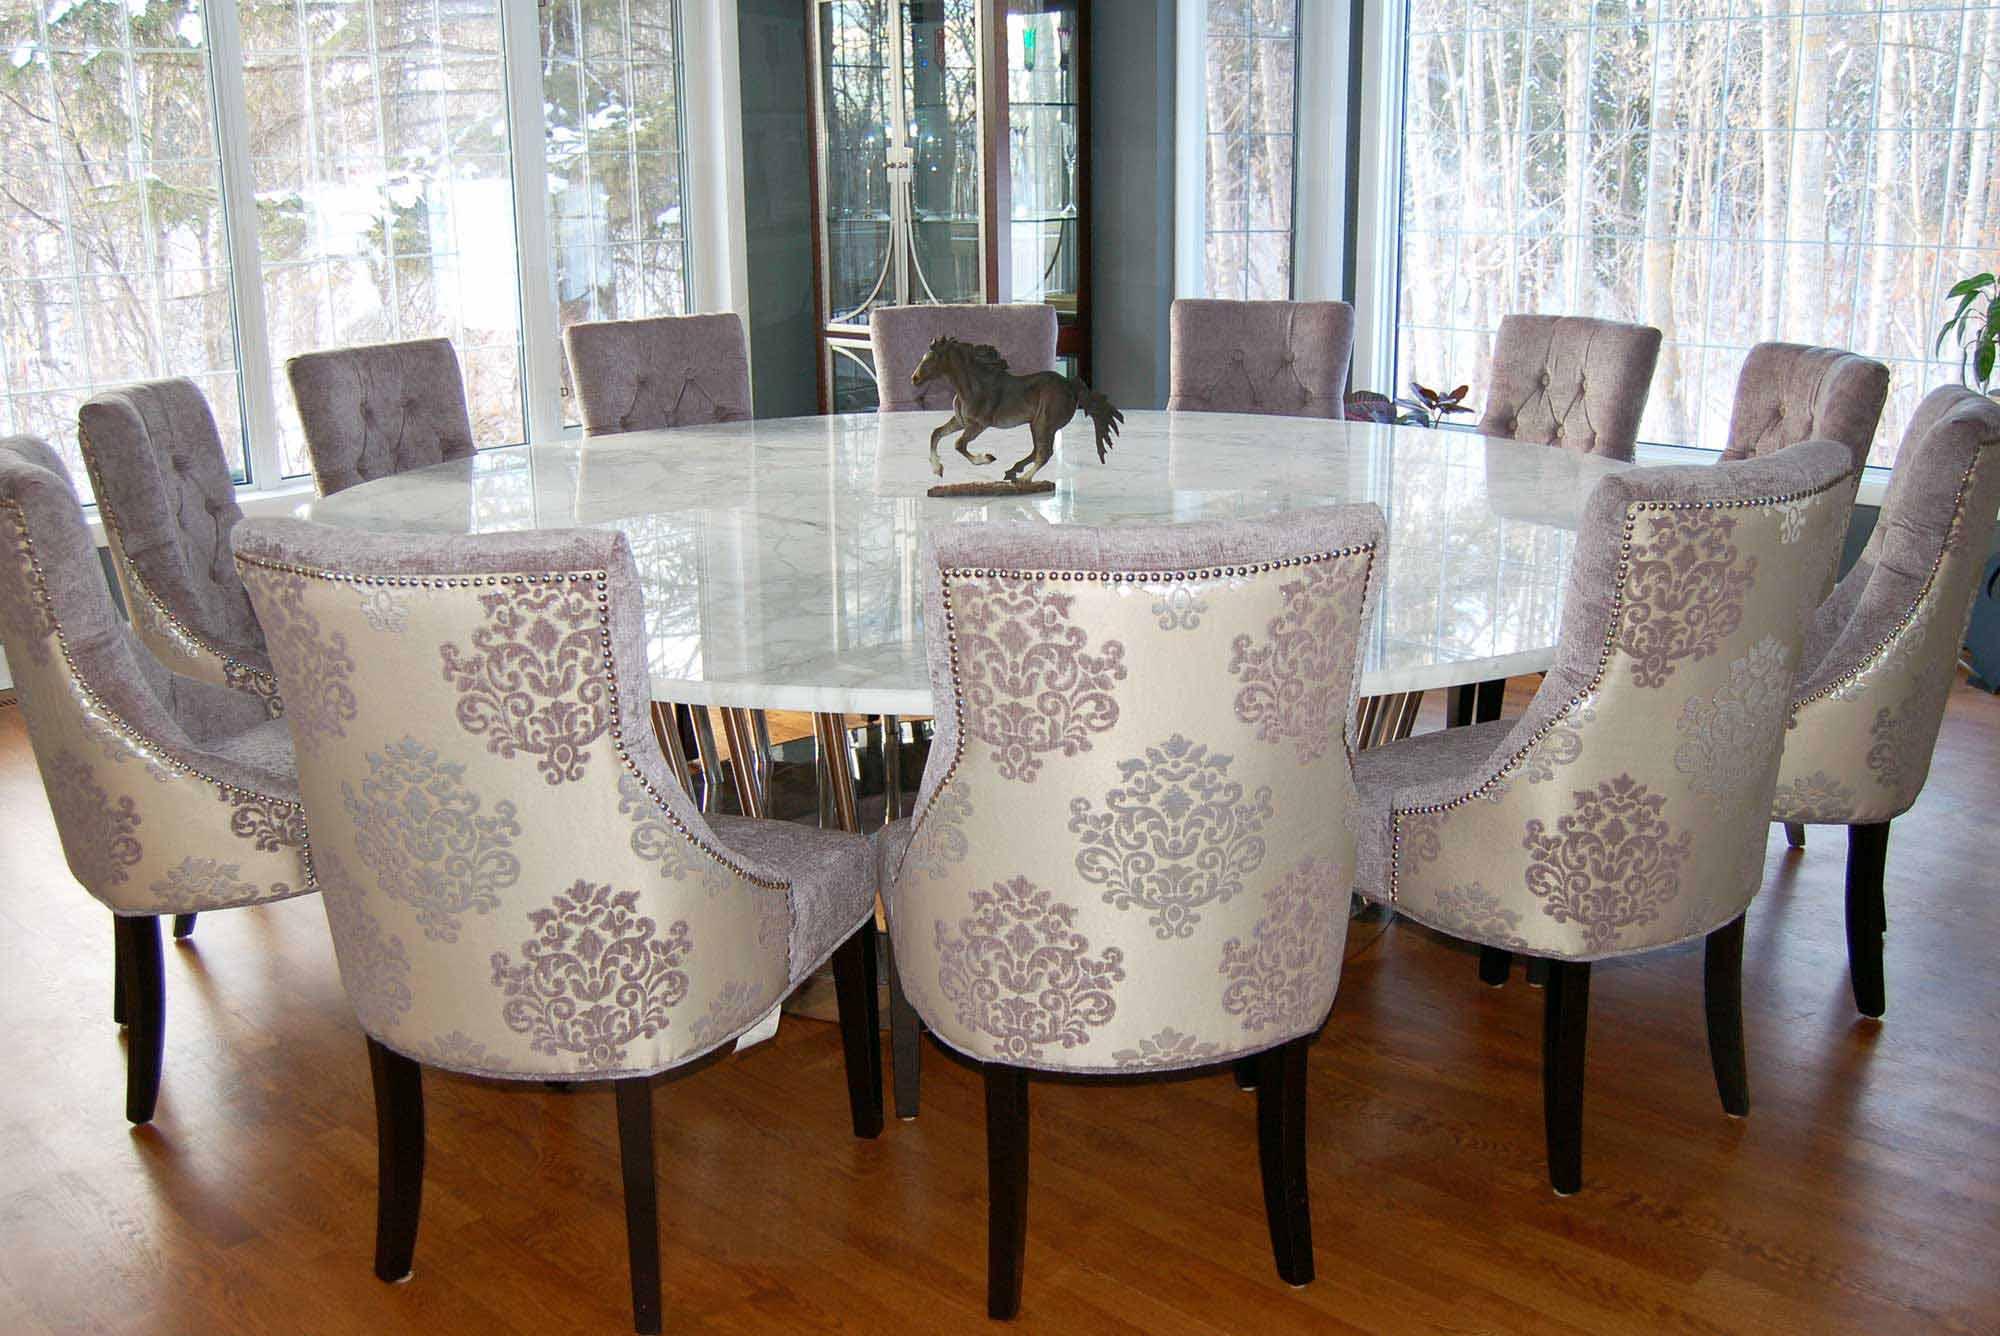 Oval Dining Table Decor Centerpiece